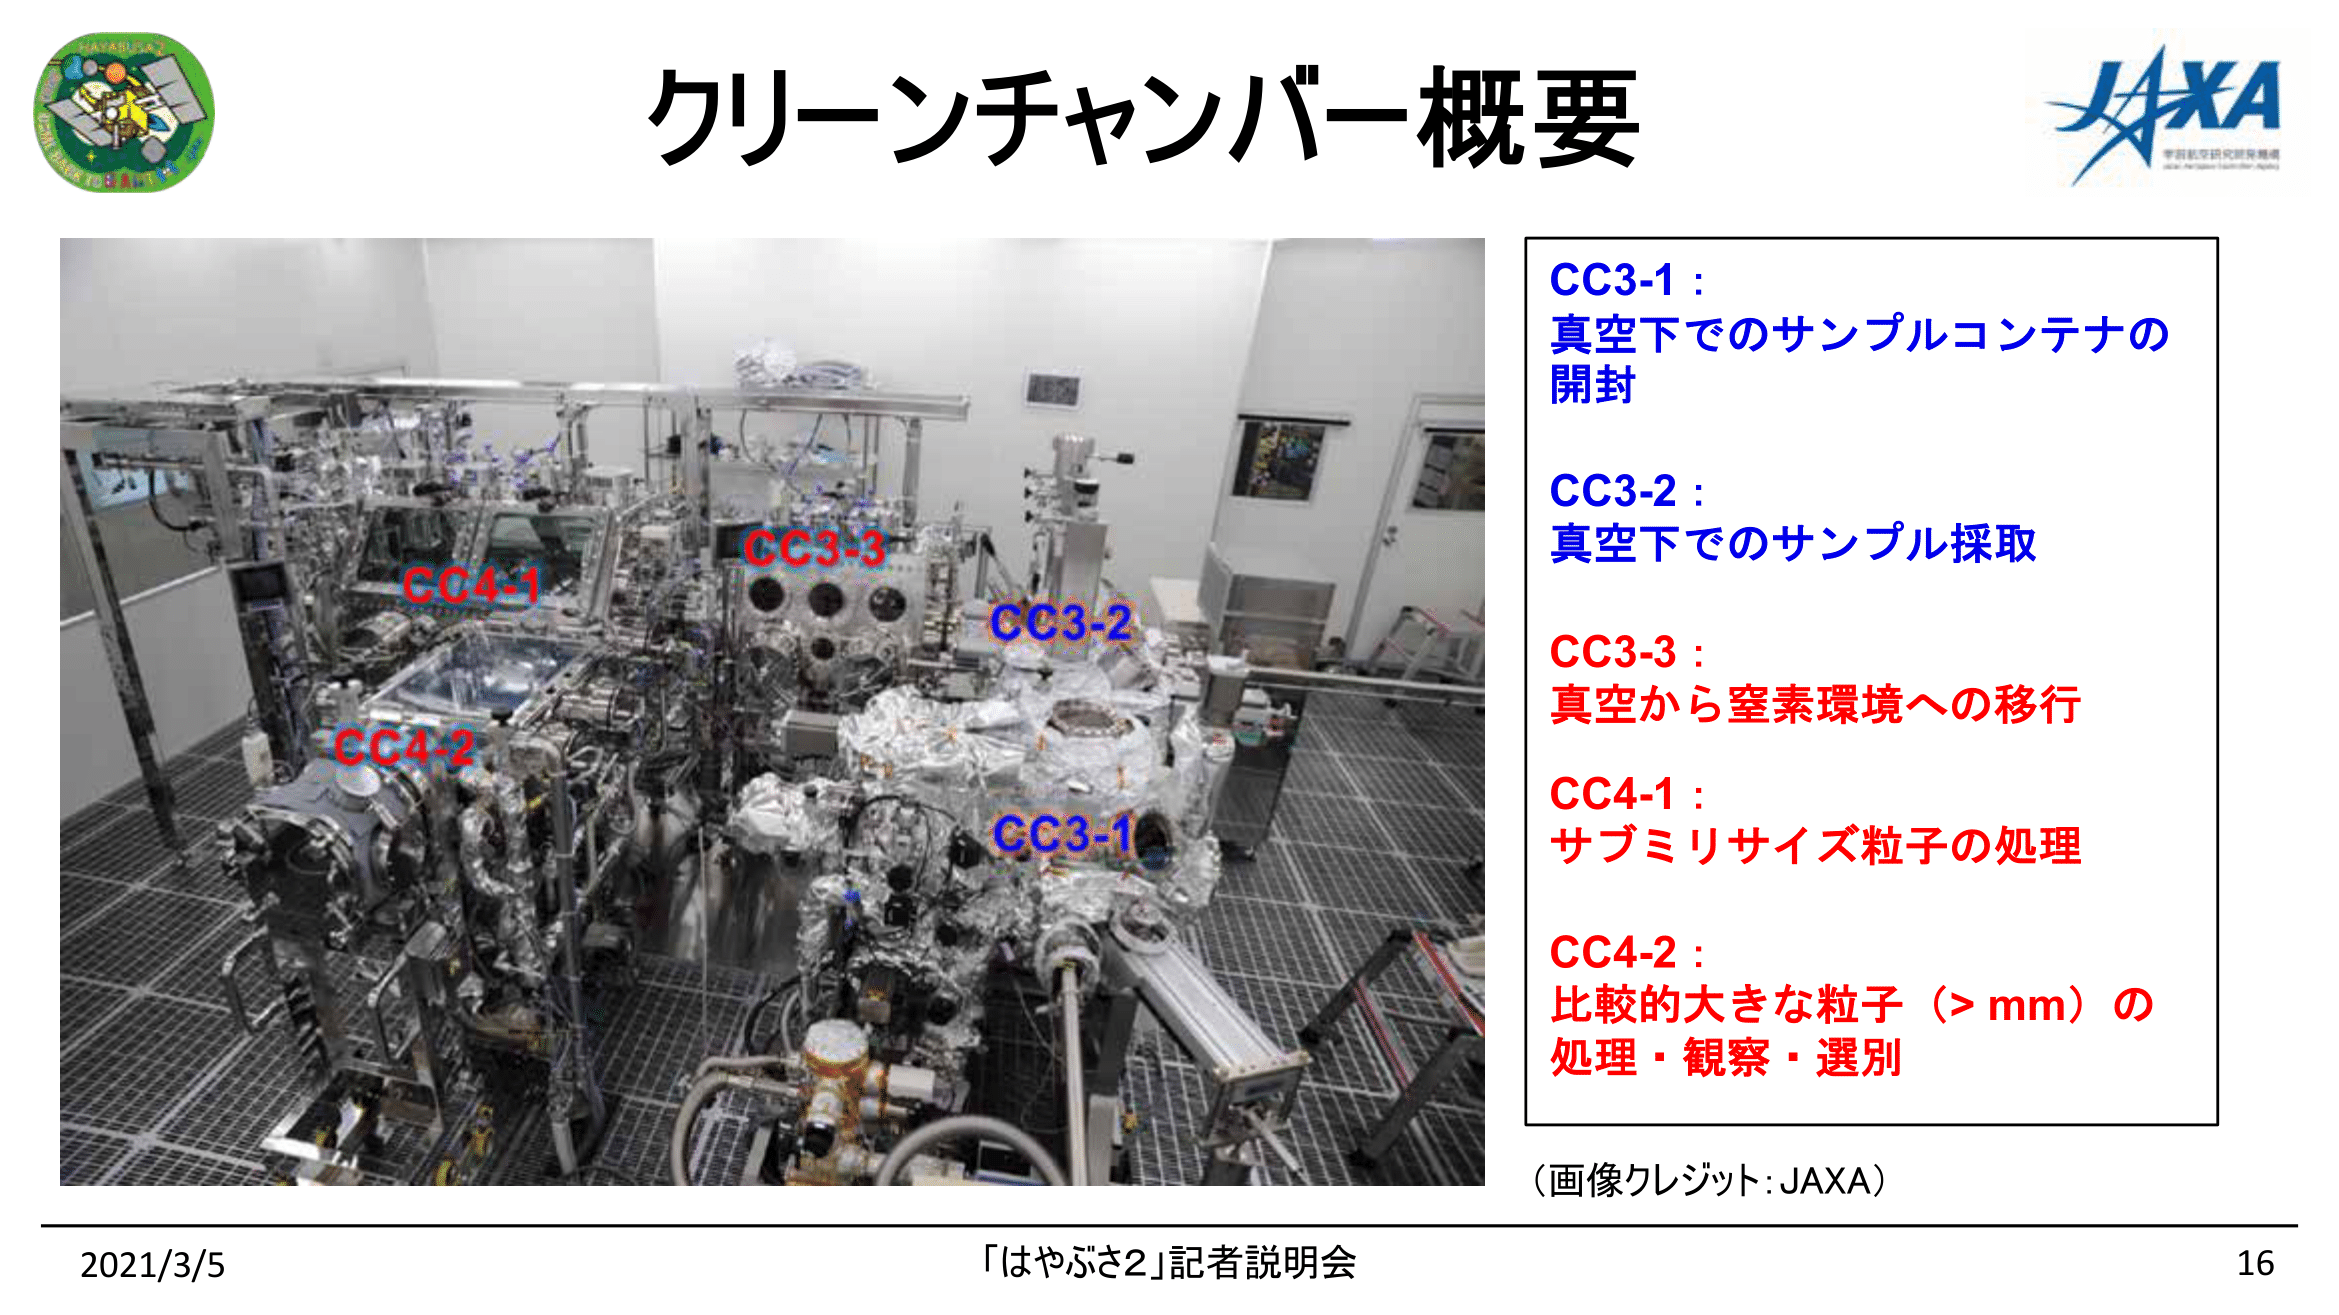 f:id:Imamura:20210305134254p:plain